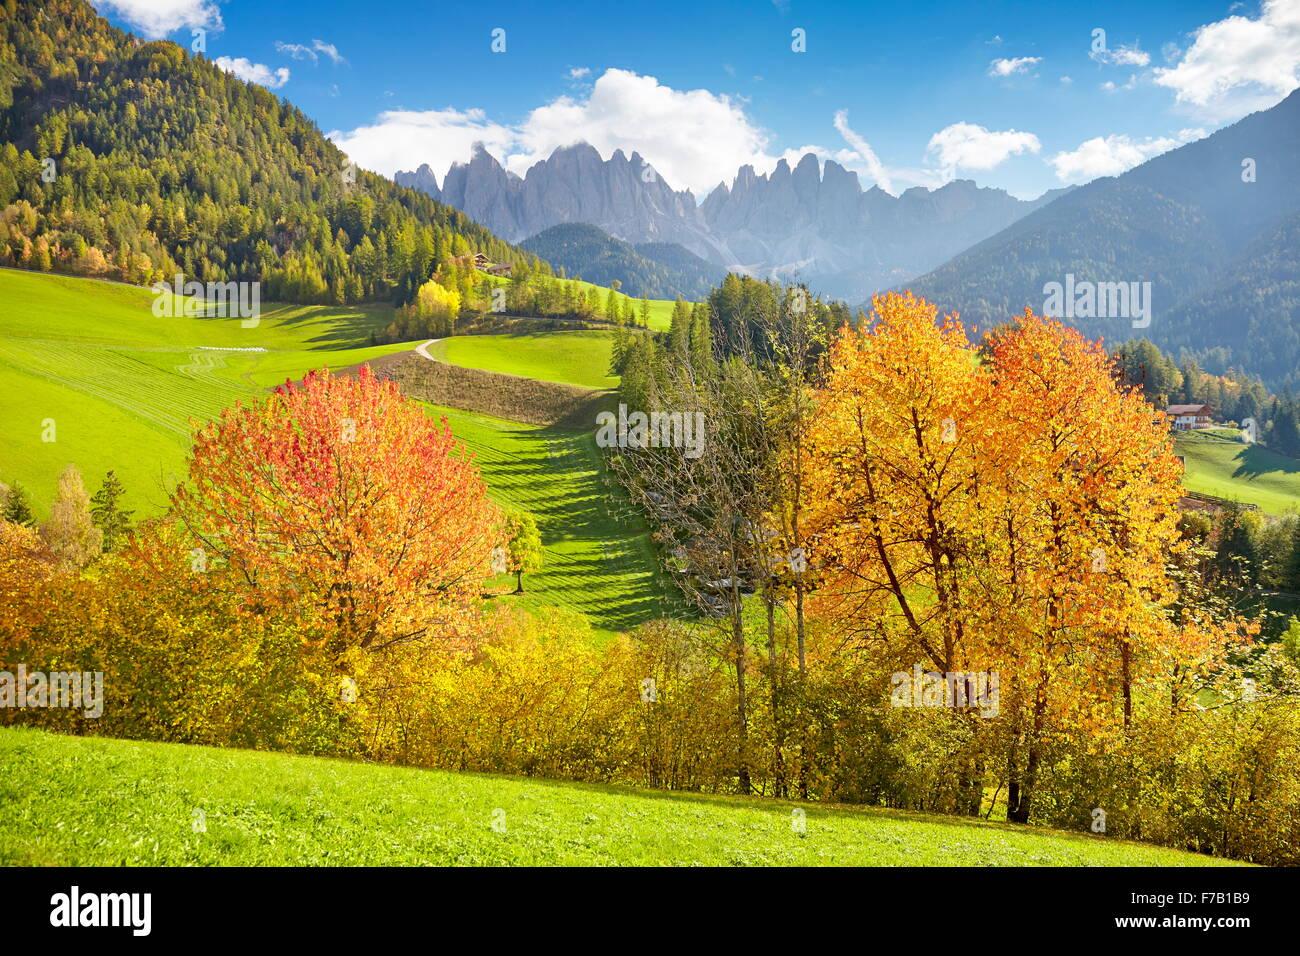 Val Di Funes in Herbstfärbung, Tyrol, Alpen, Dolomiten, Italien Stockbild